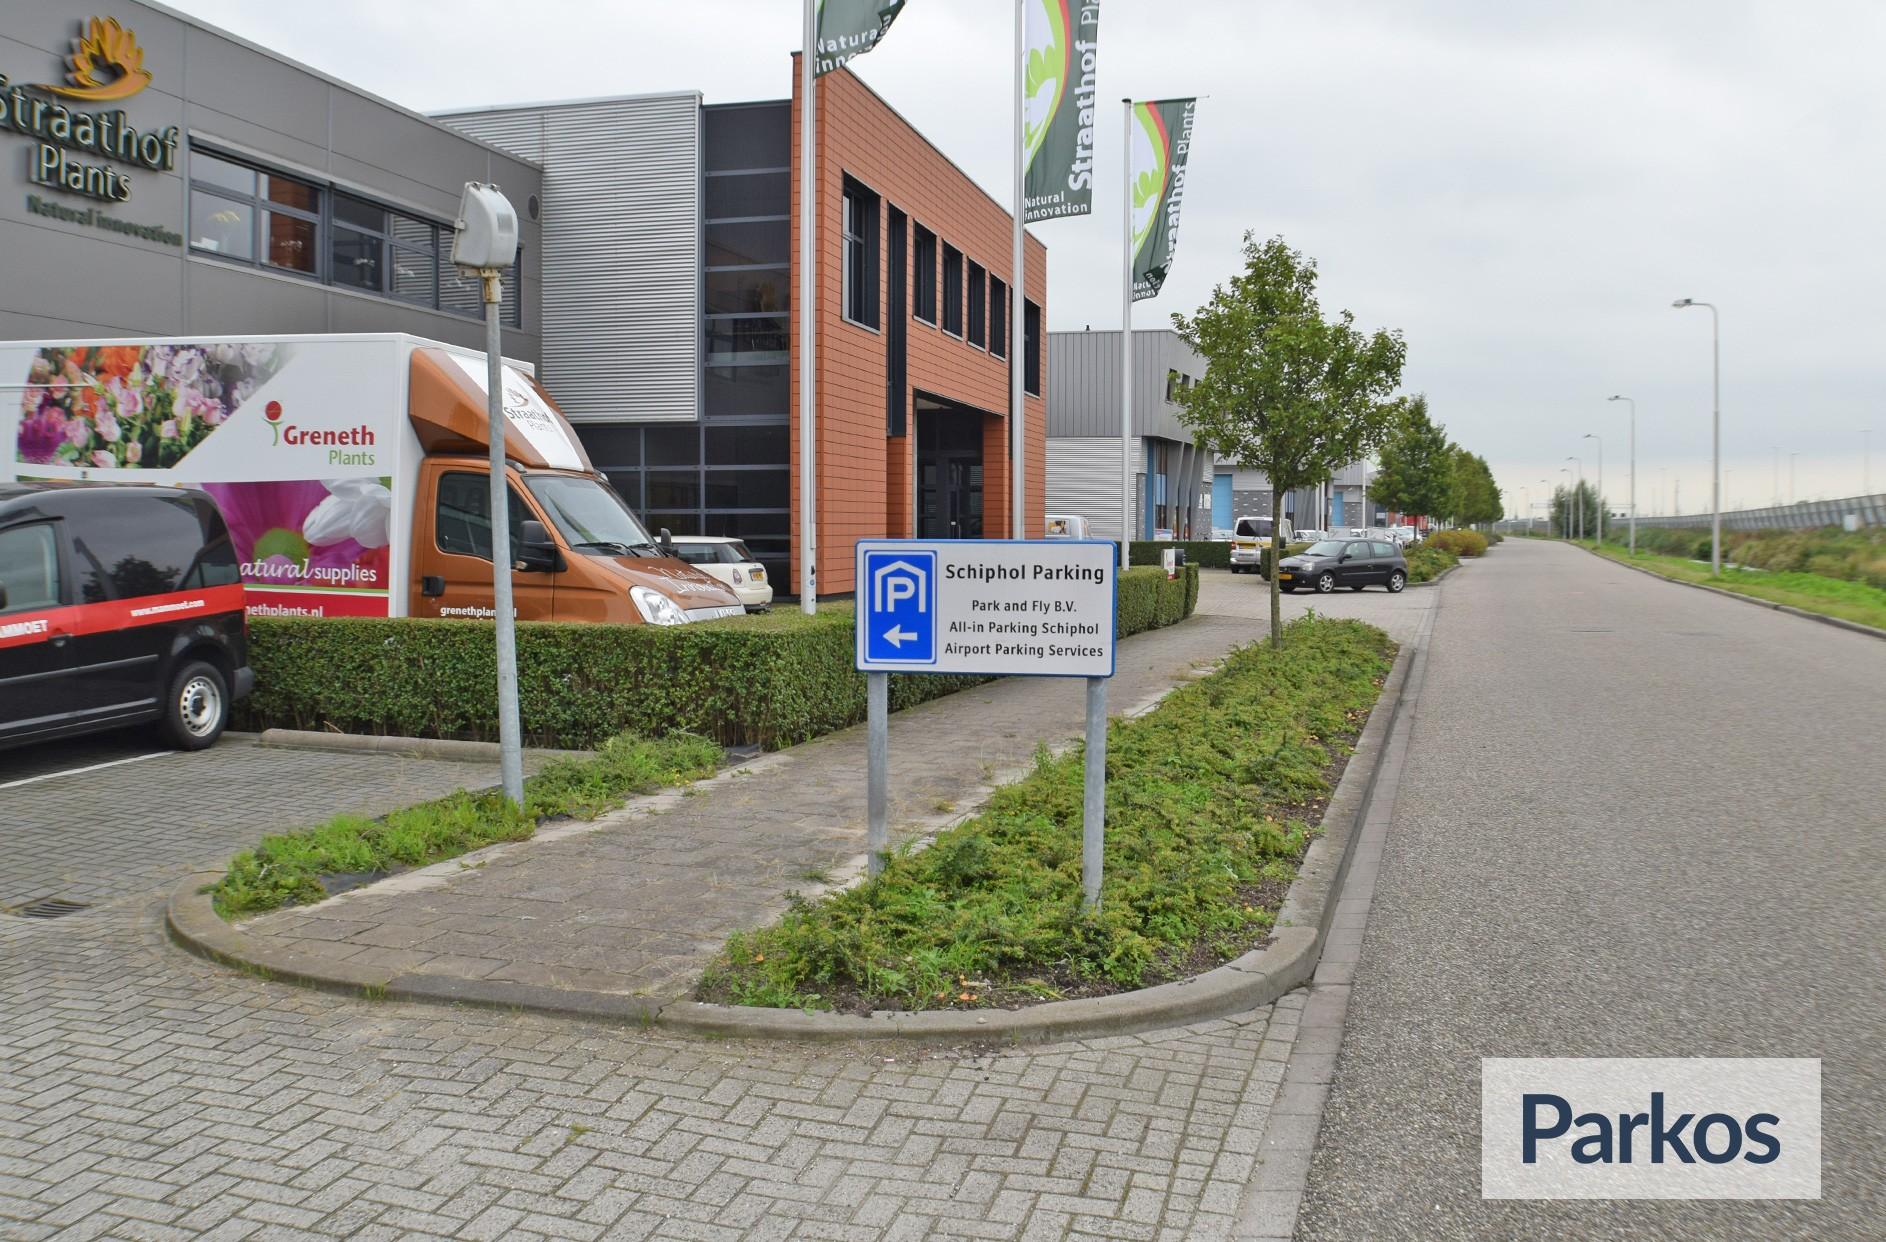 Total Care Parking: Reviews, ervaringen en prijzen: https://parkos.be/total-care-parking.html